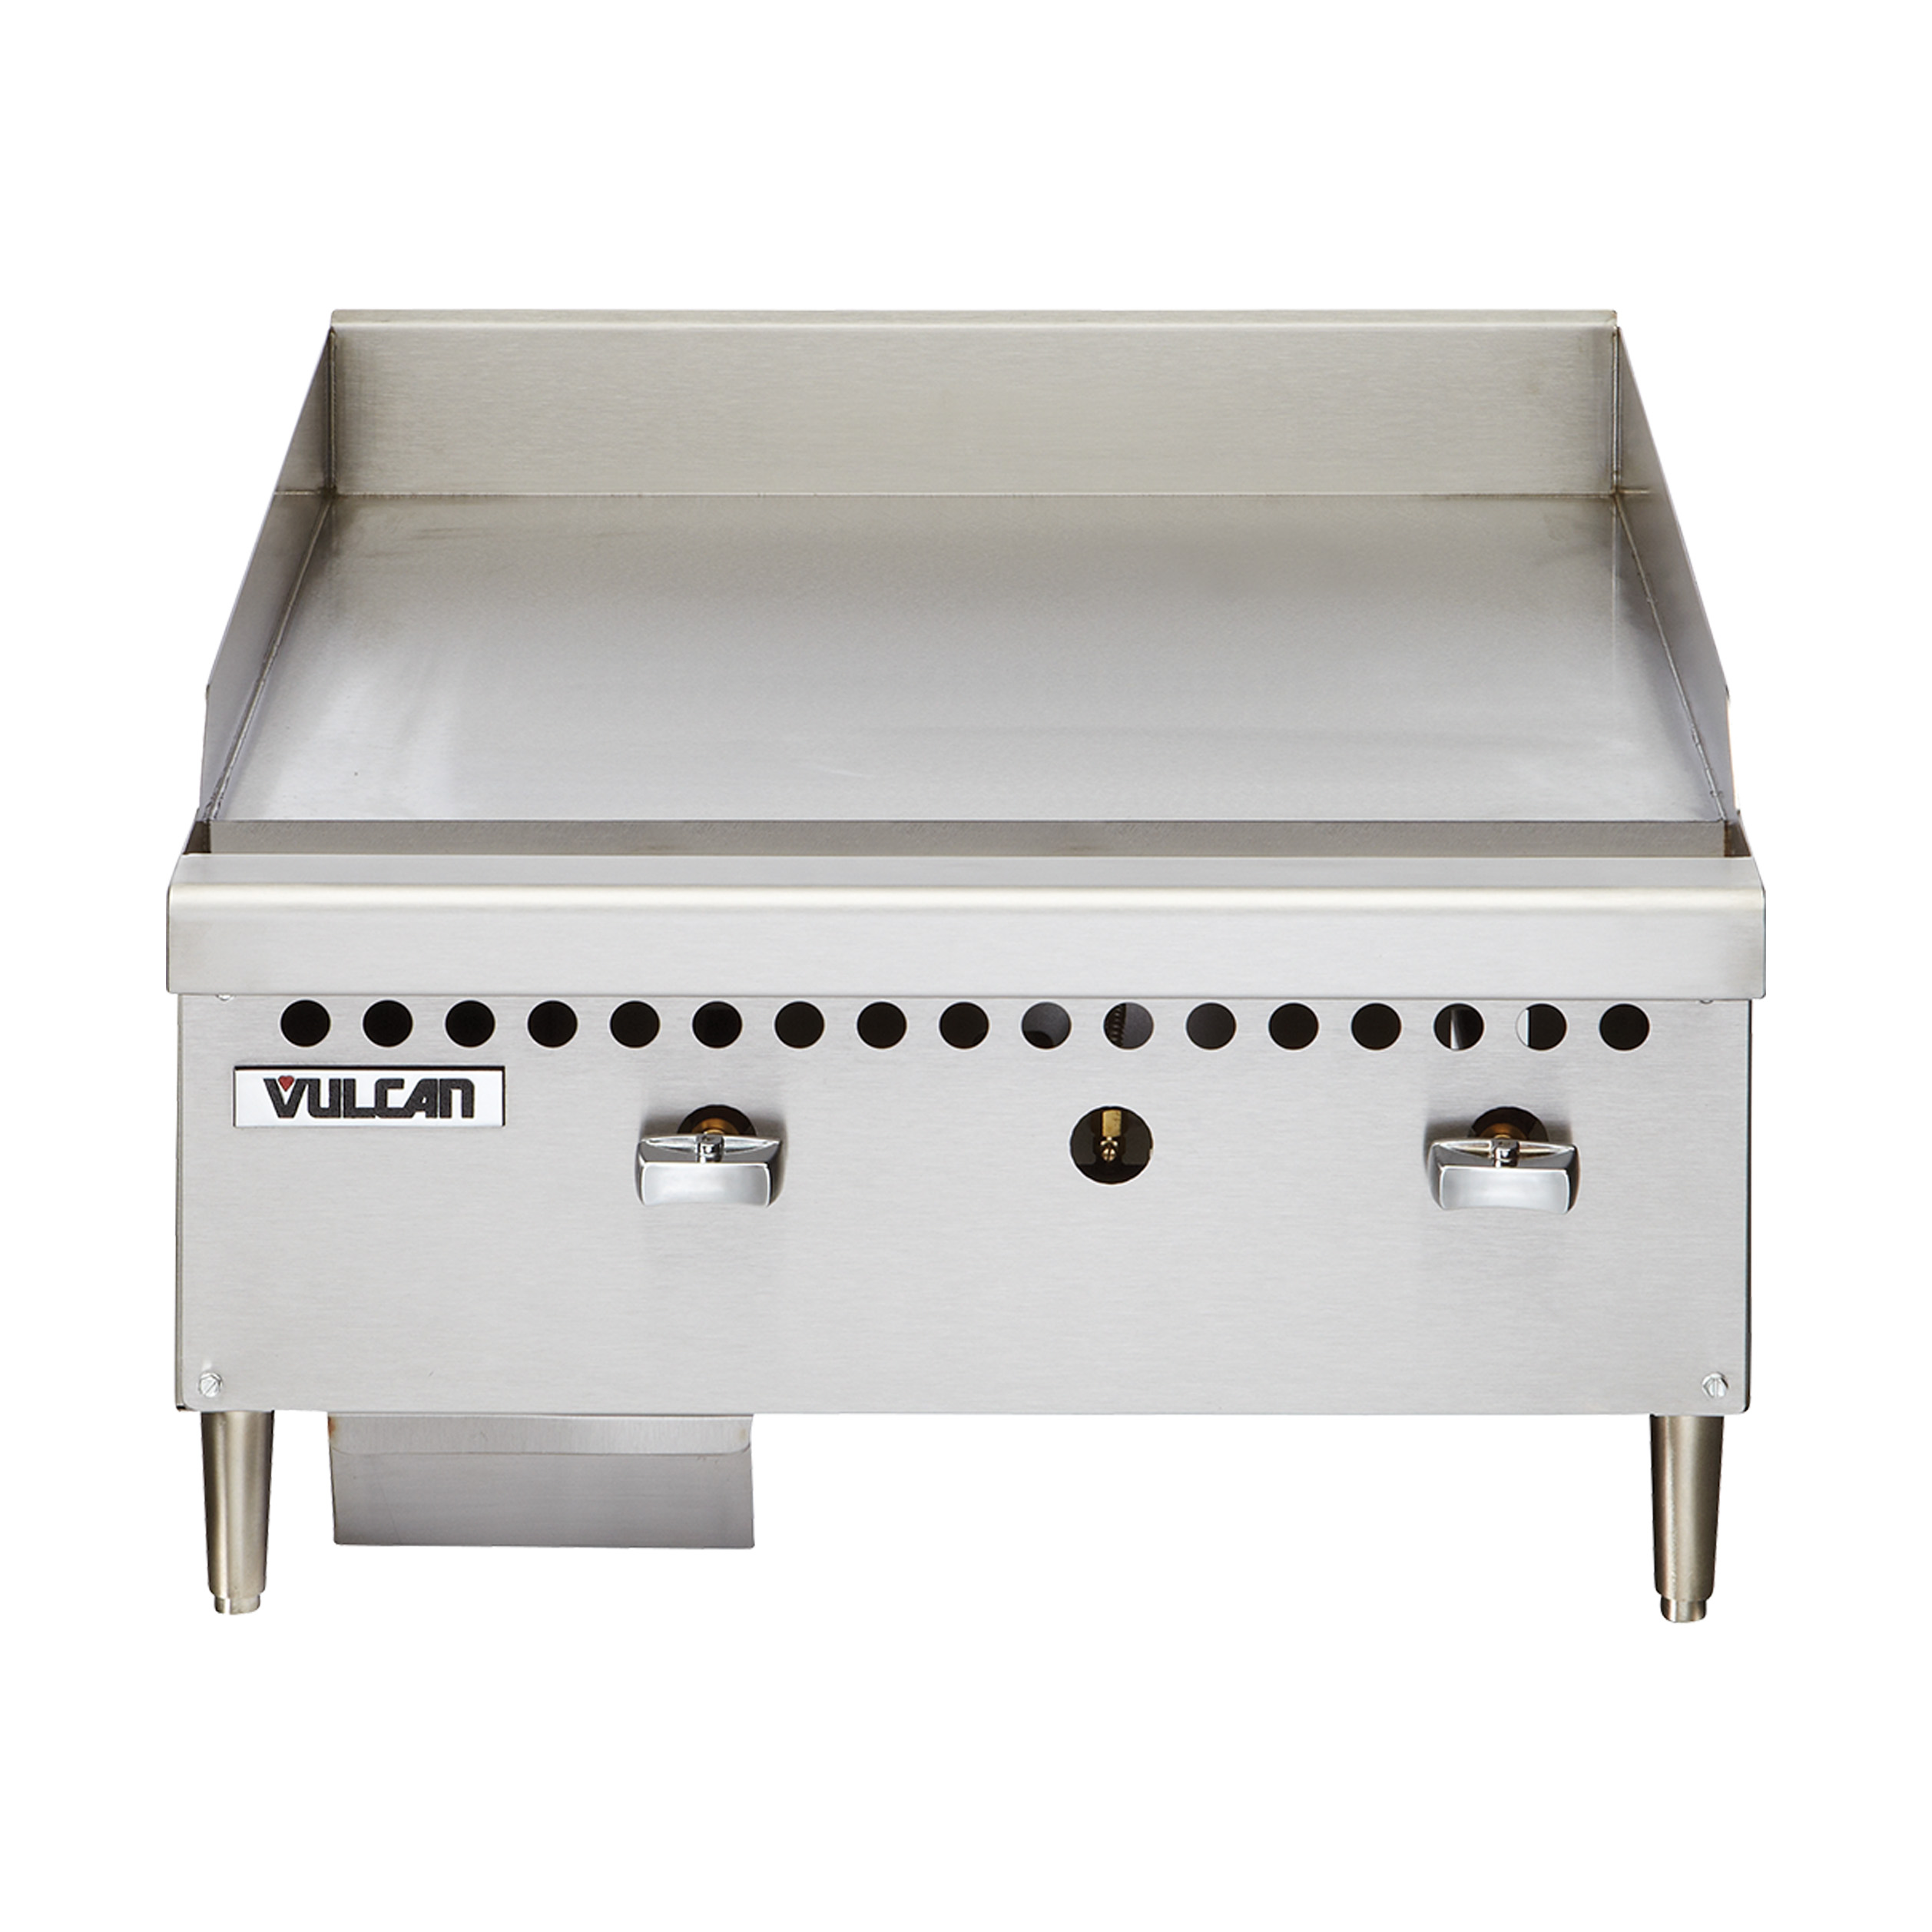 VCRG36-M Vulcan griddle, gas, countertop